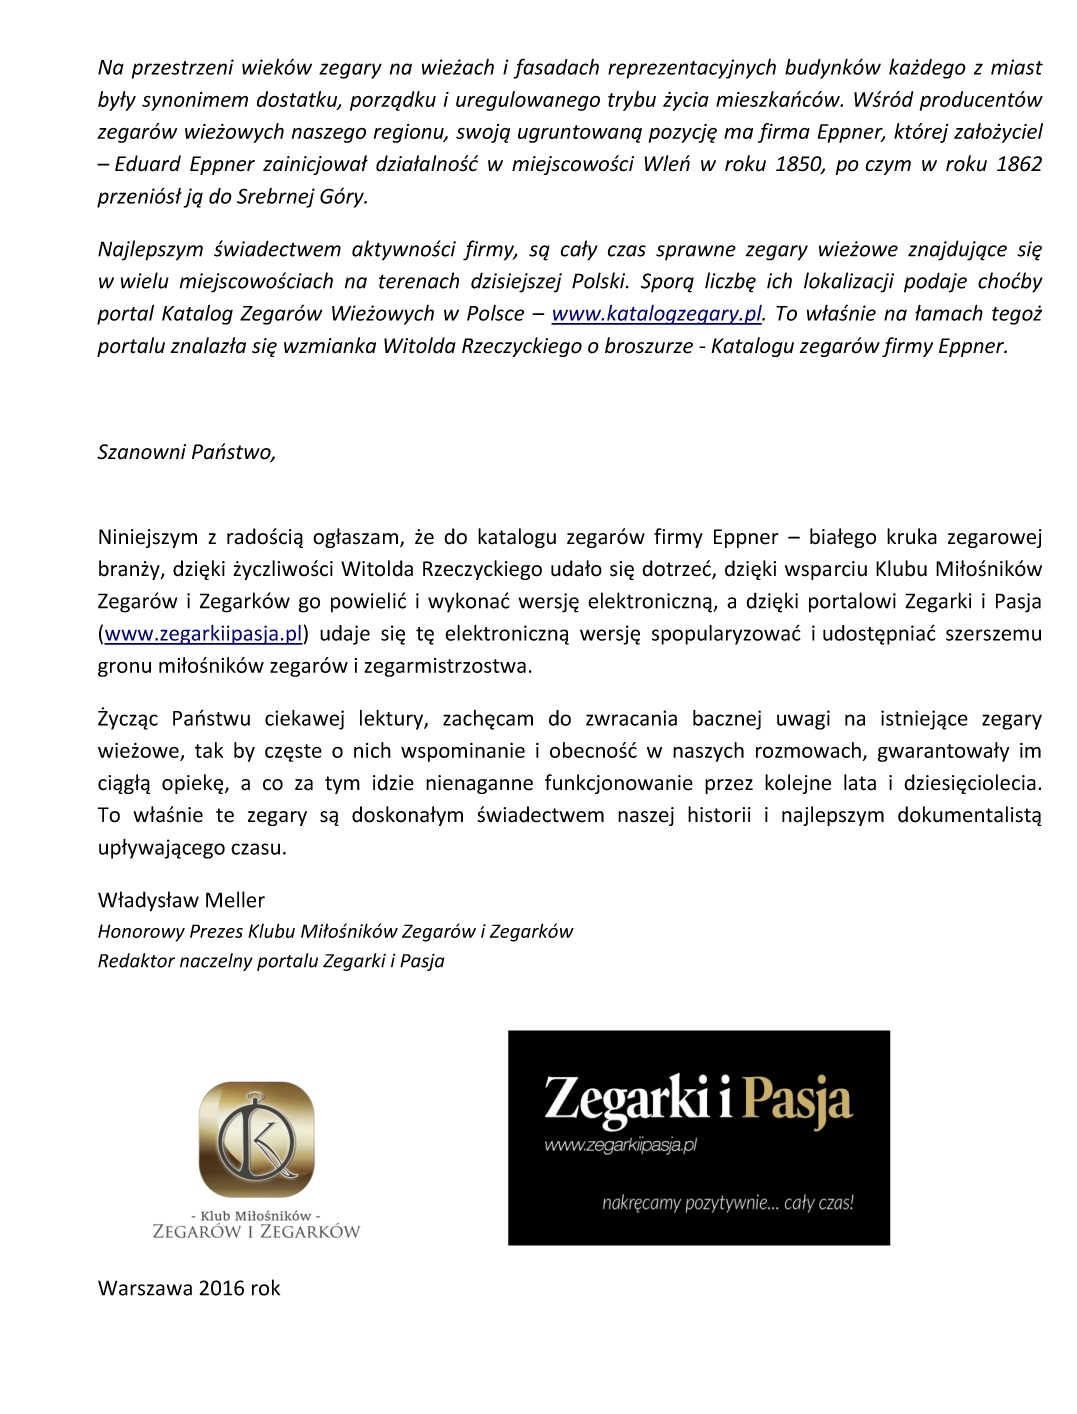 000-katalog-zegarow-Eppner-wstepne